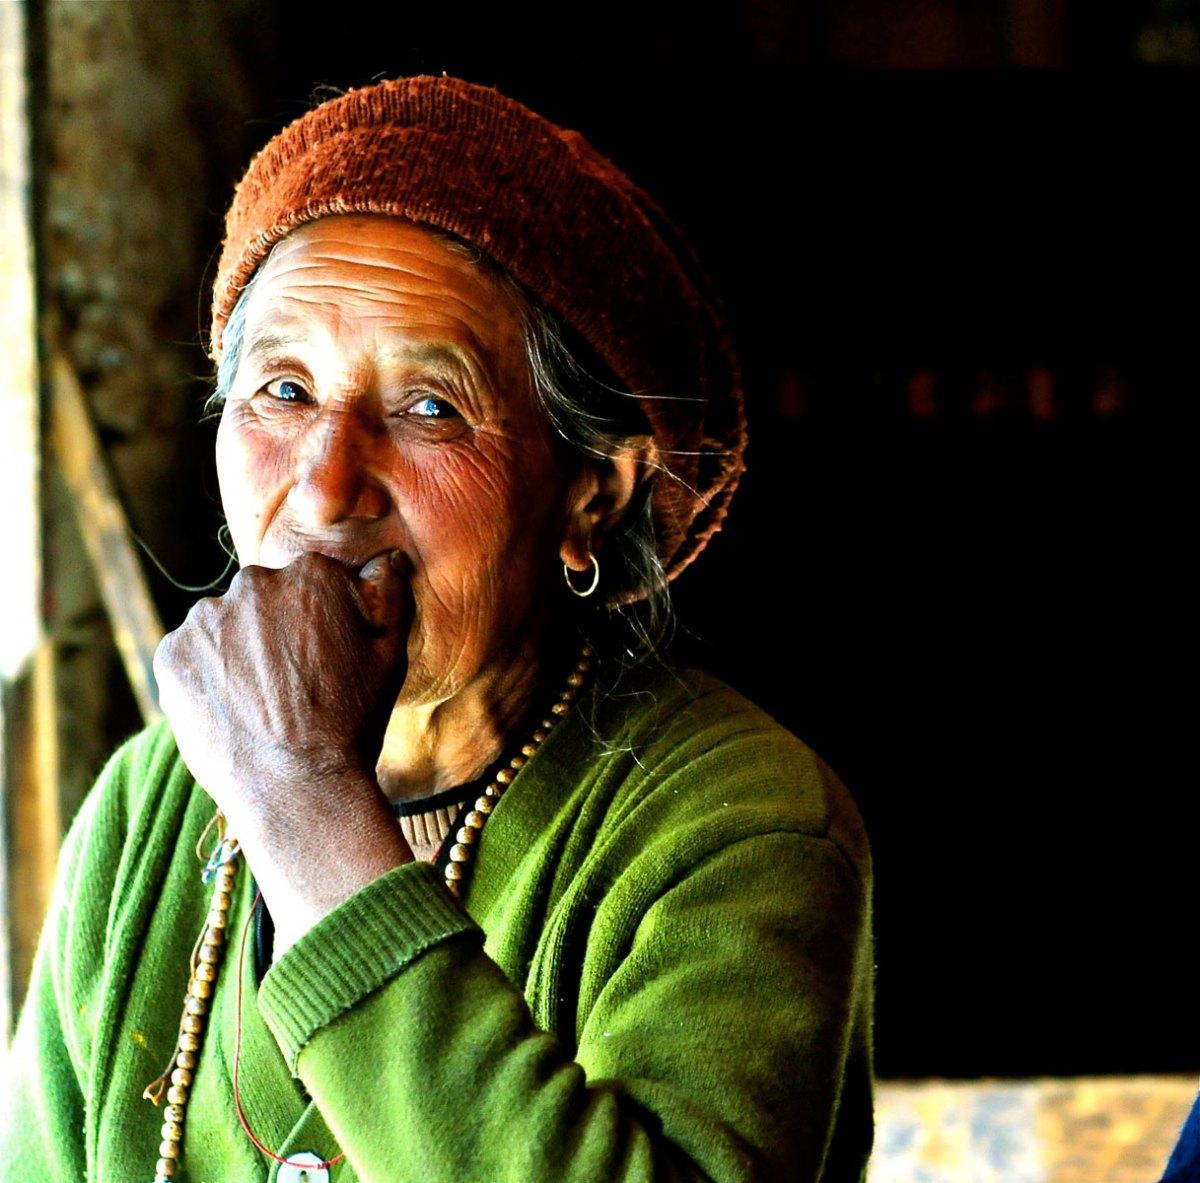 A tribute to the beautiful Nepali women!